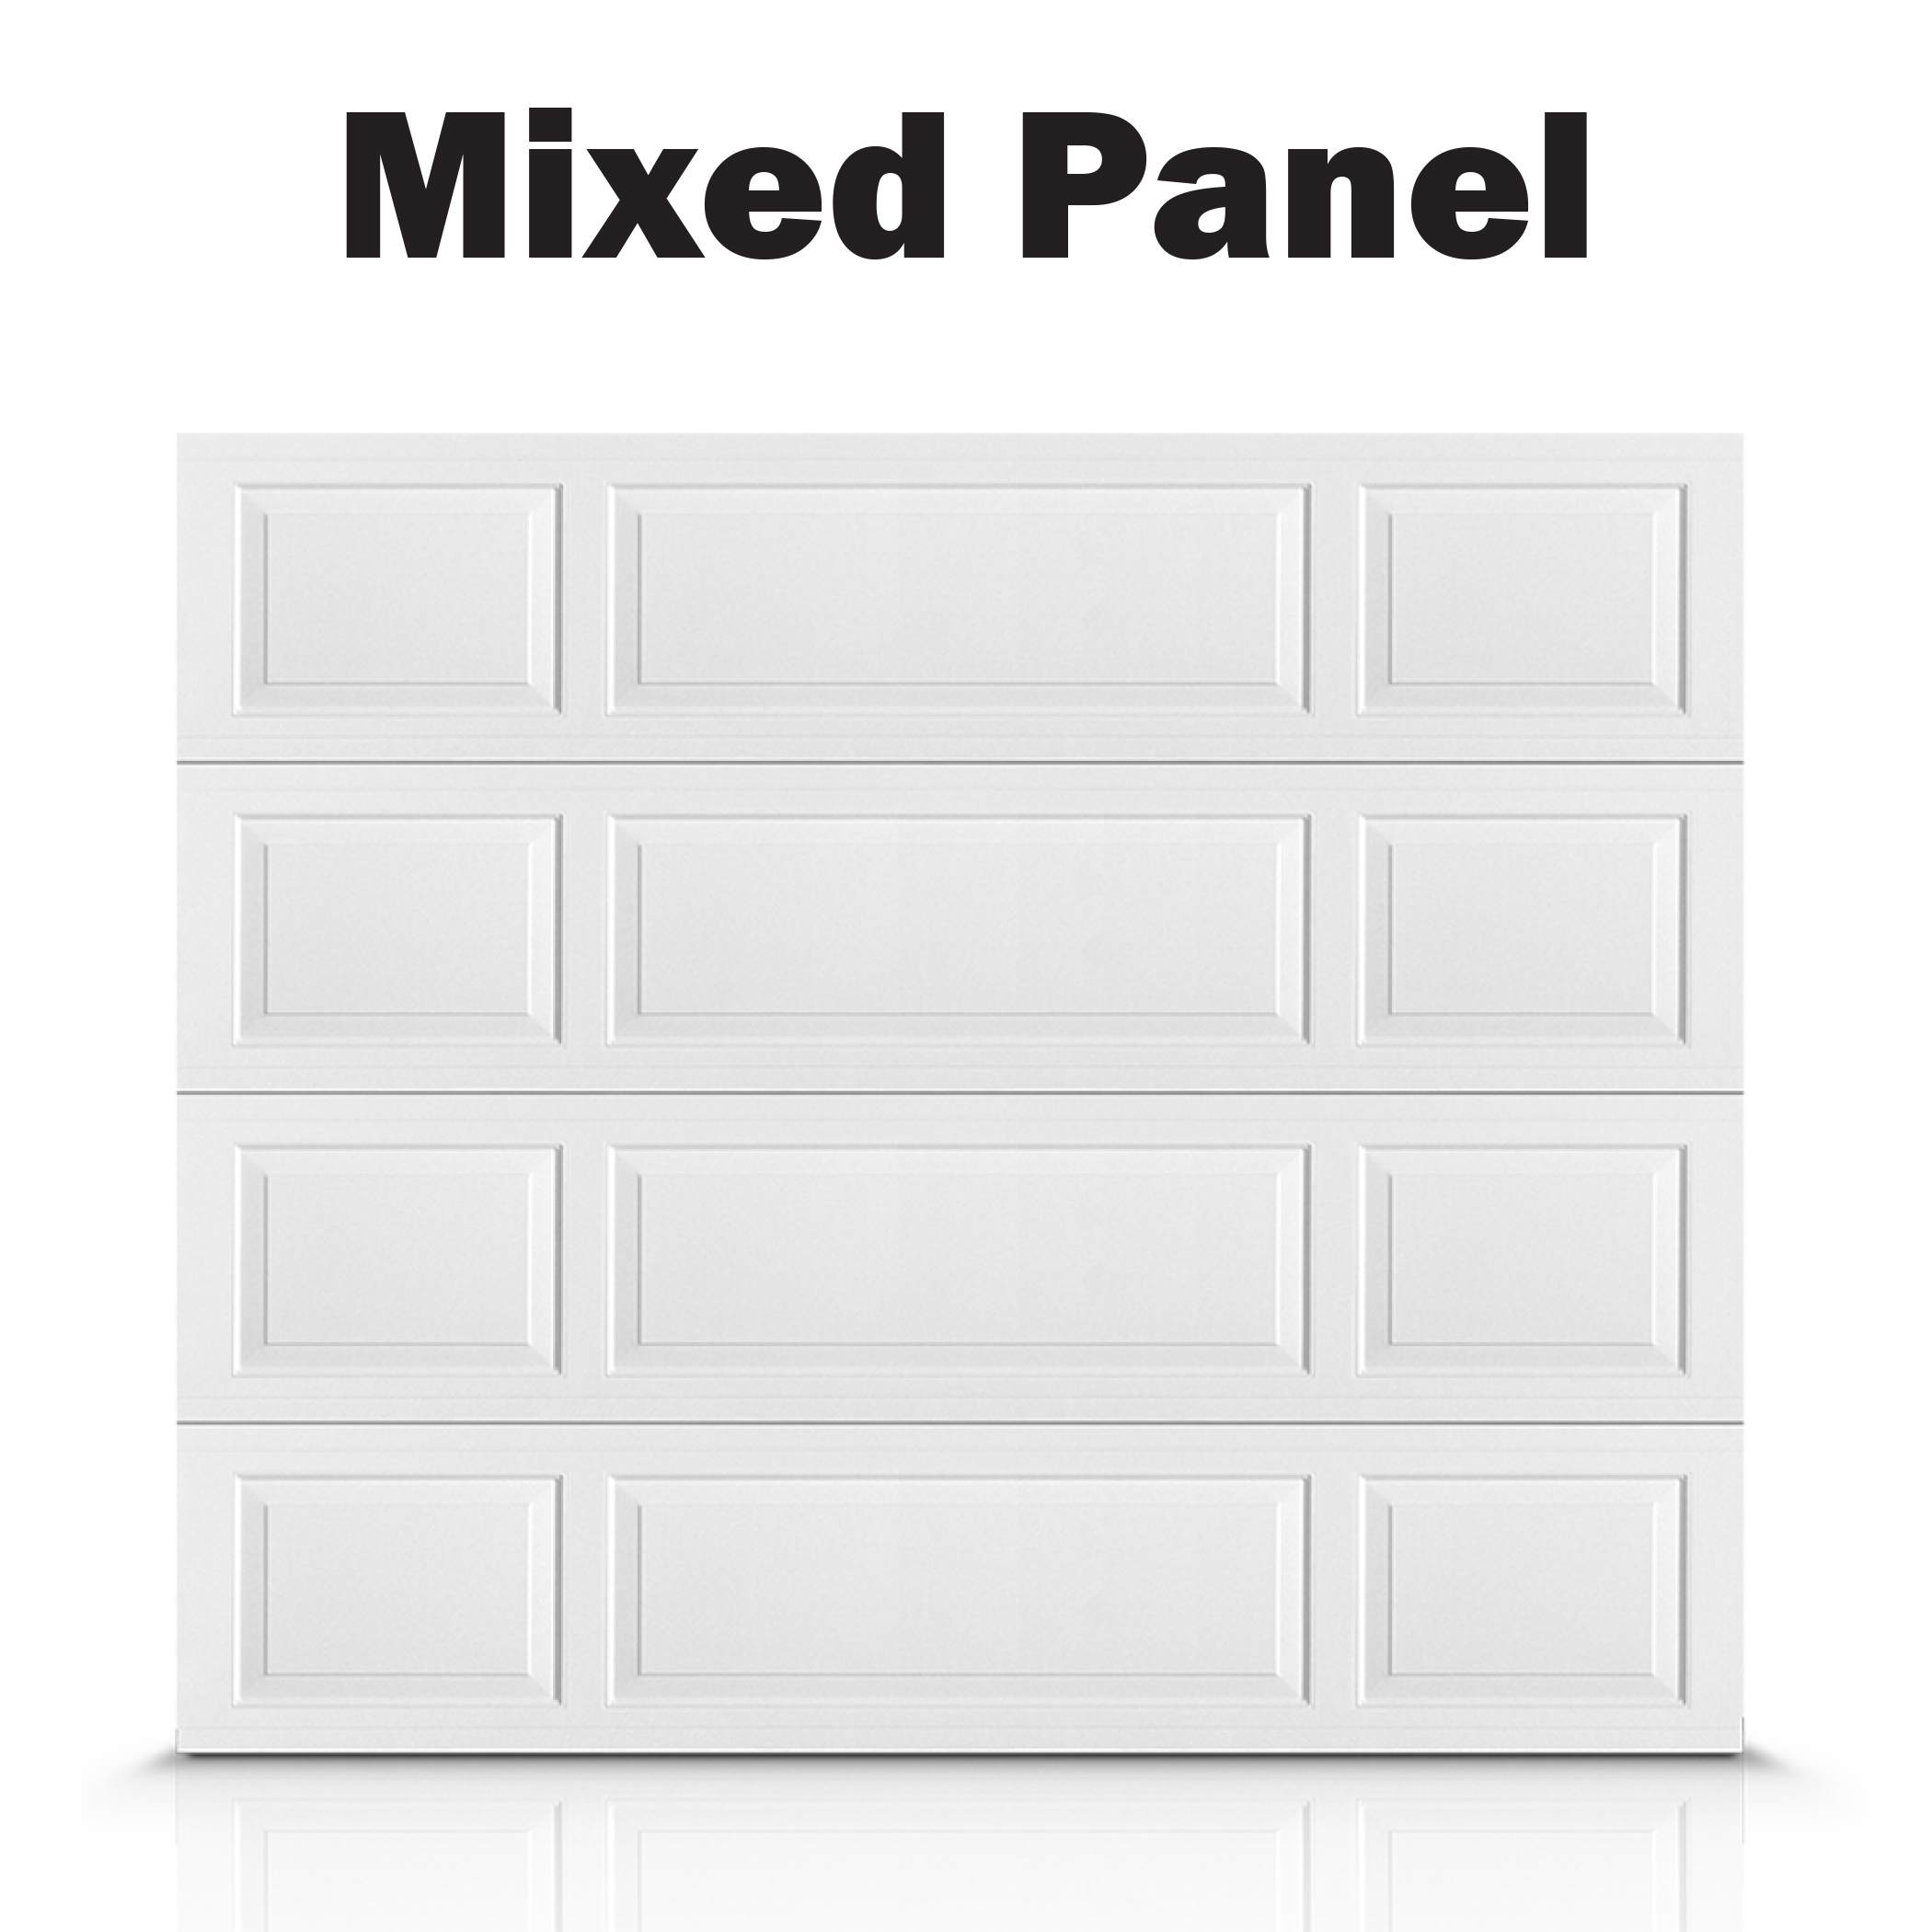 Mixed Panel - Premium.jpg